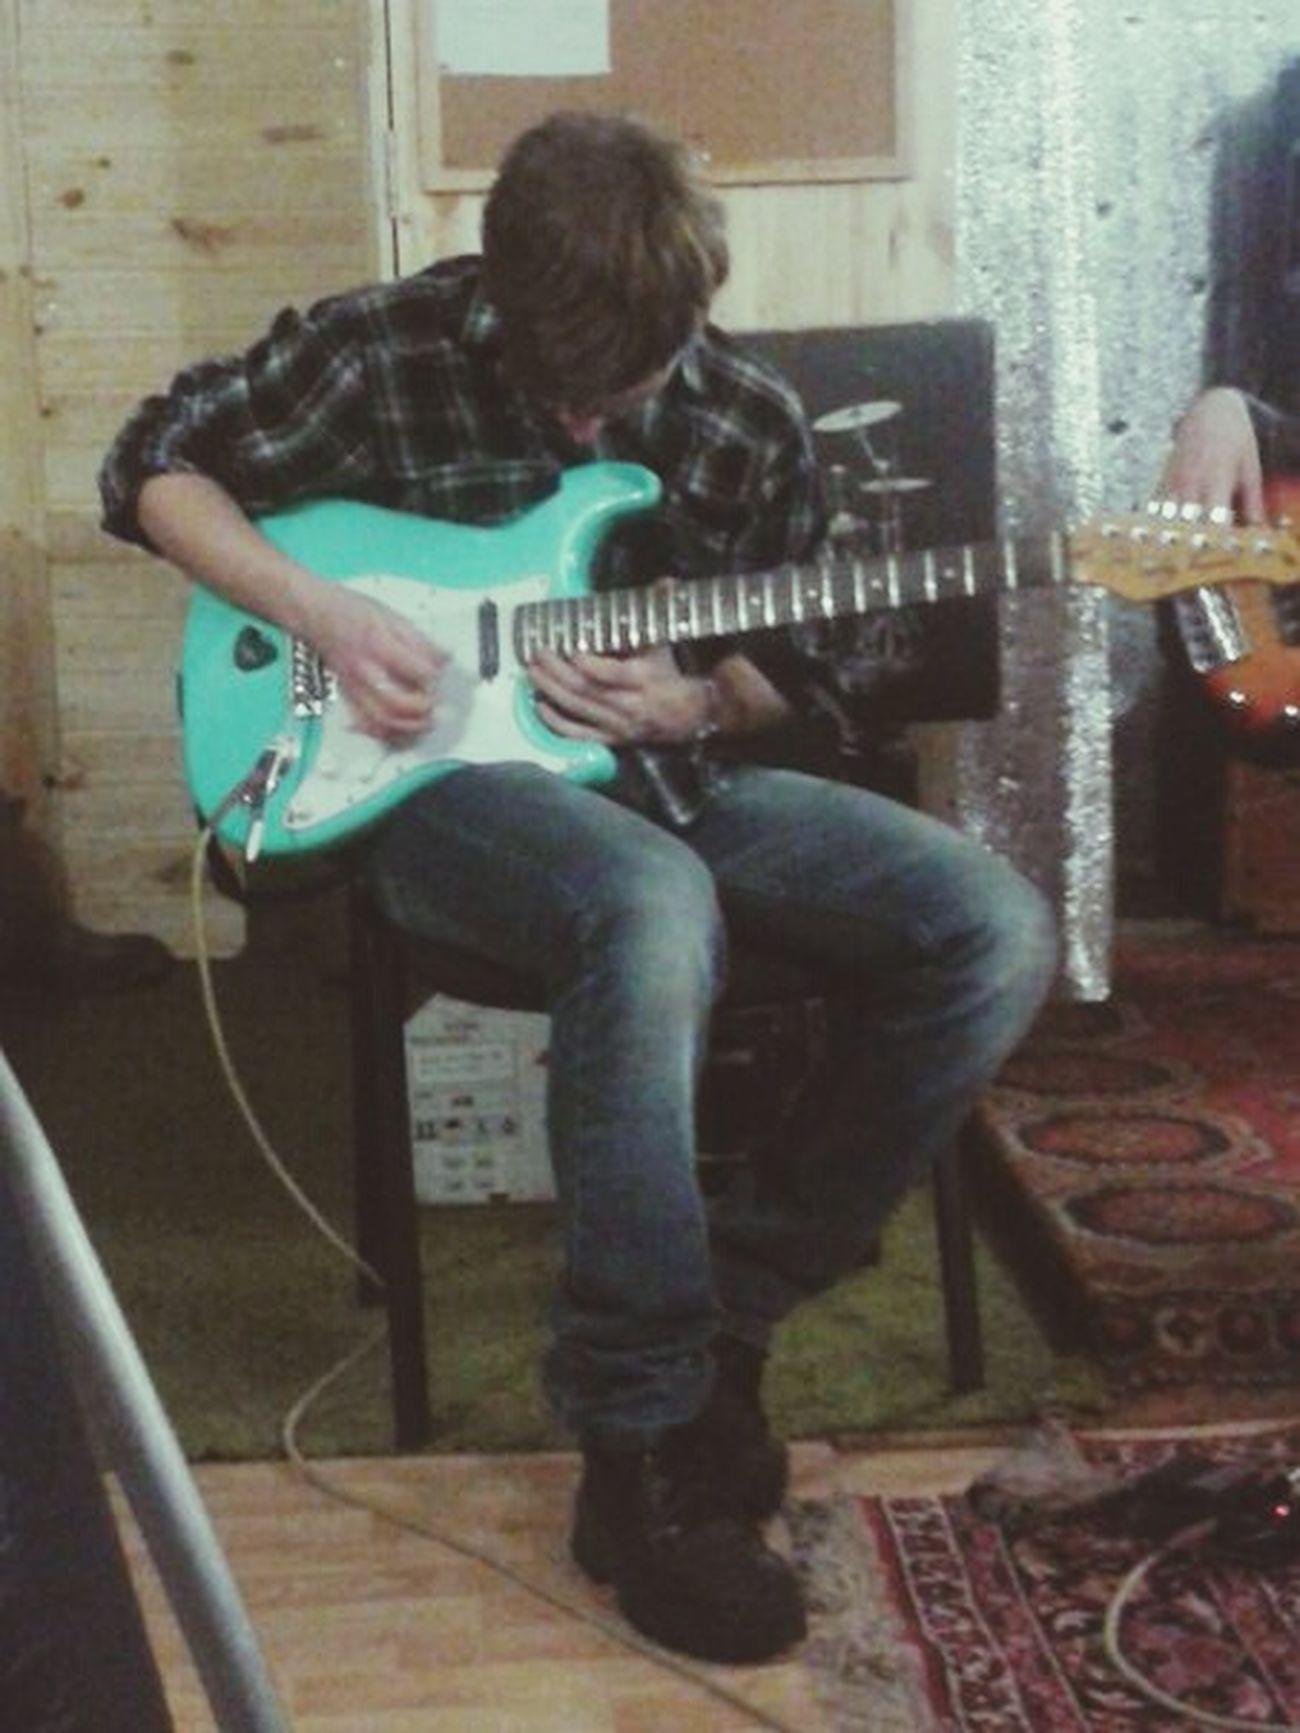 Guitar Fender Guitarist Light Blue Friends Music Musician Electric Guitar Still Loving You Scorpions